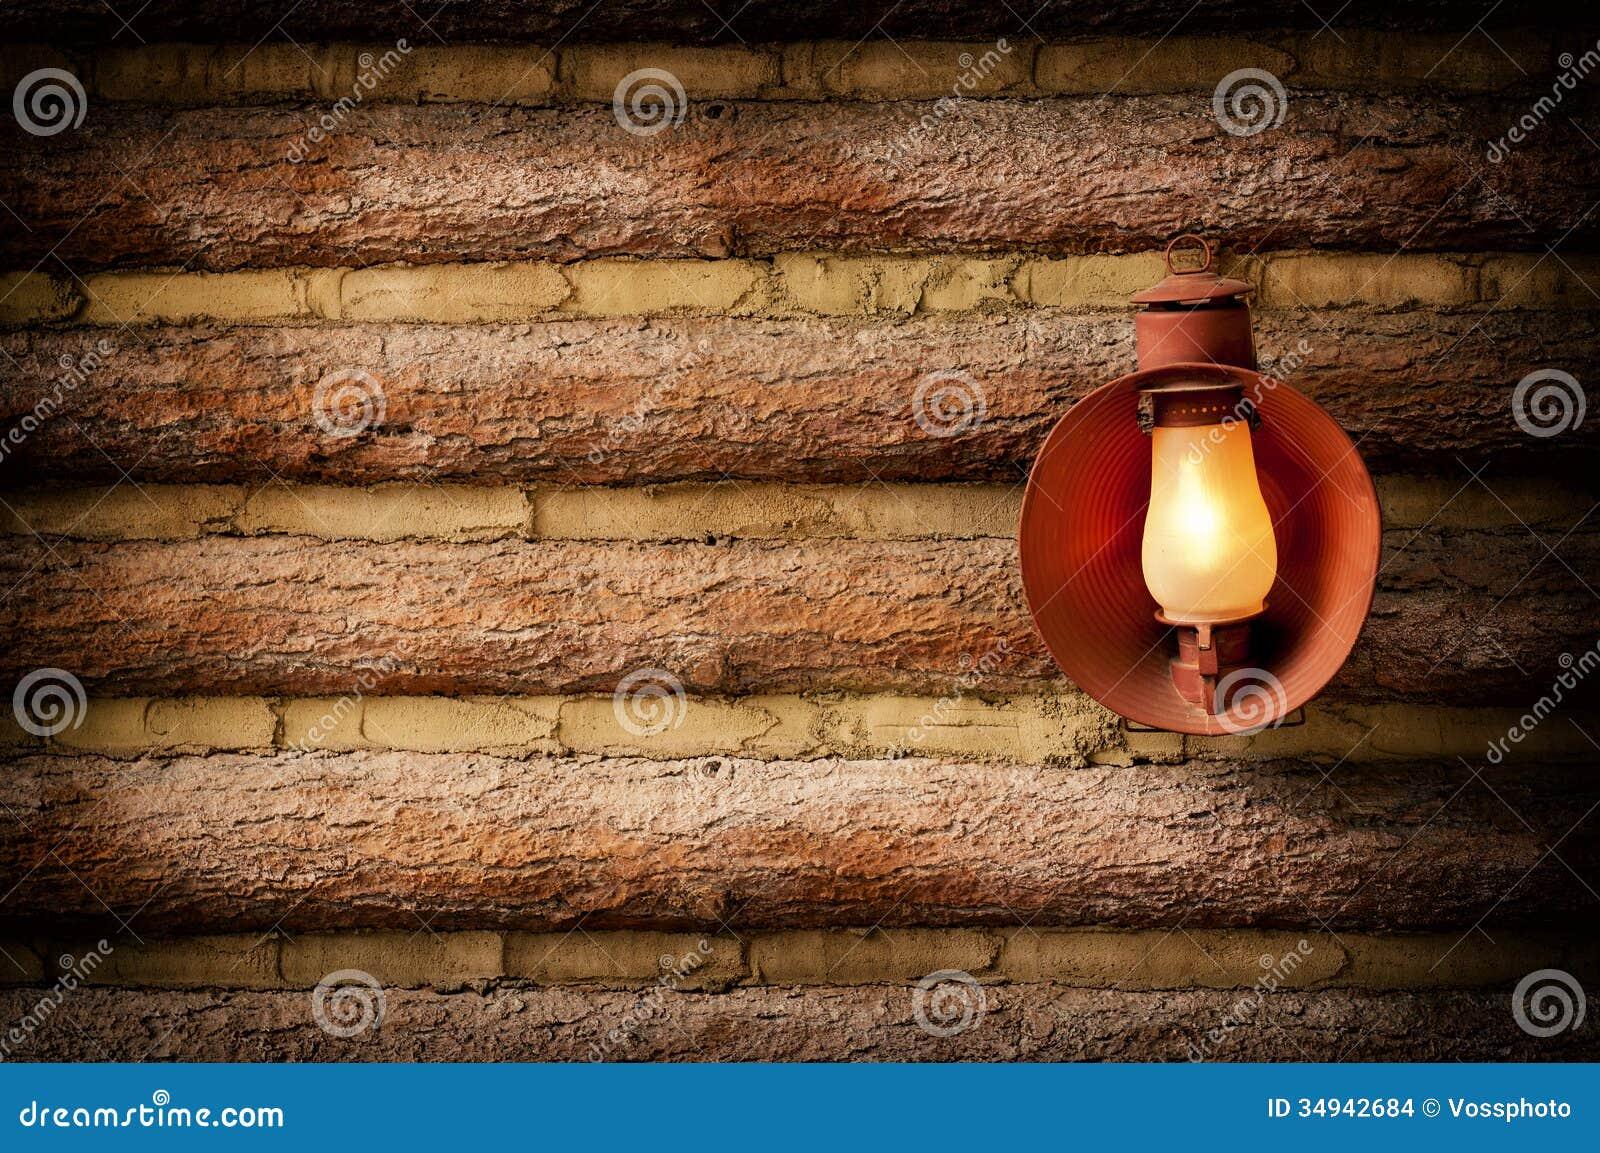 Log Cabin With Lantern Stock Images Image 34942684